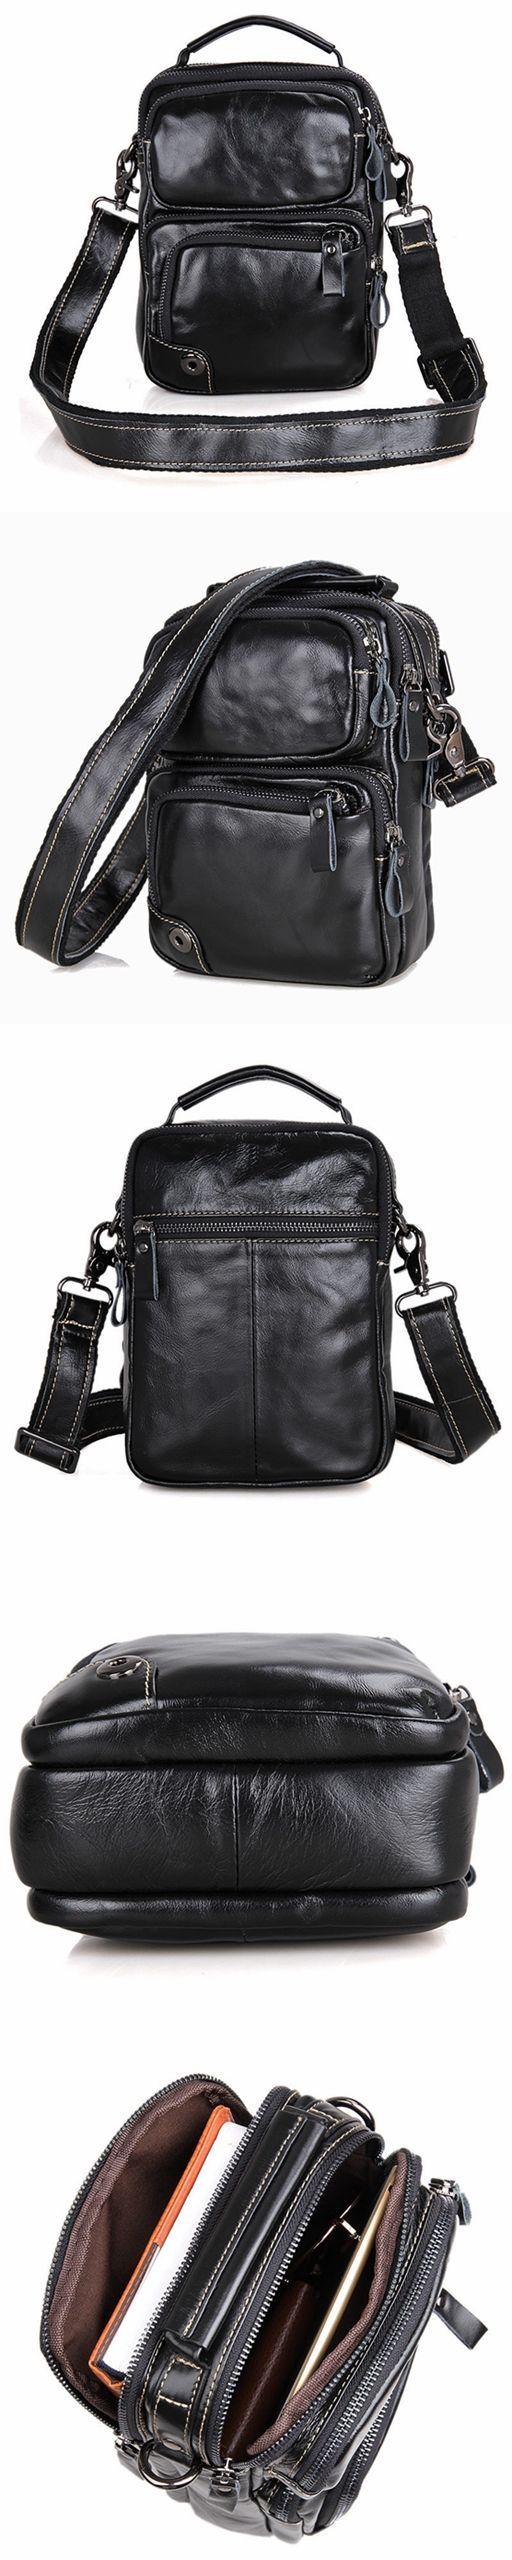 Cross Bag For Man Vertical Messenger Bag Men Large Messenger Bags 1010 80deba3467c50